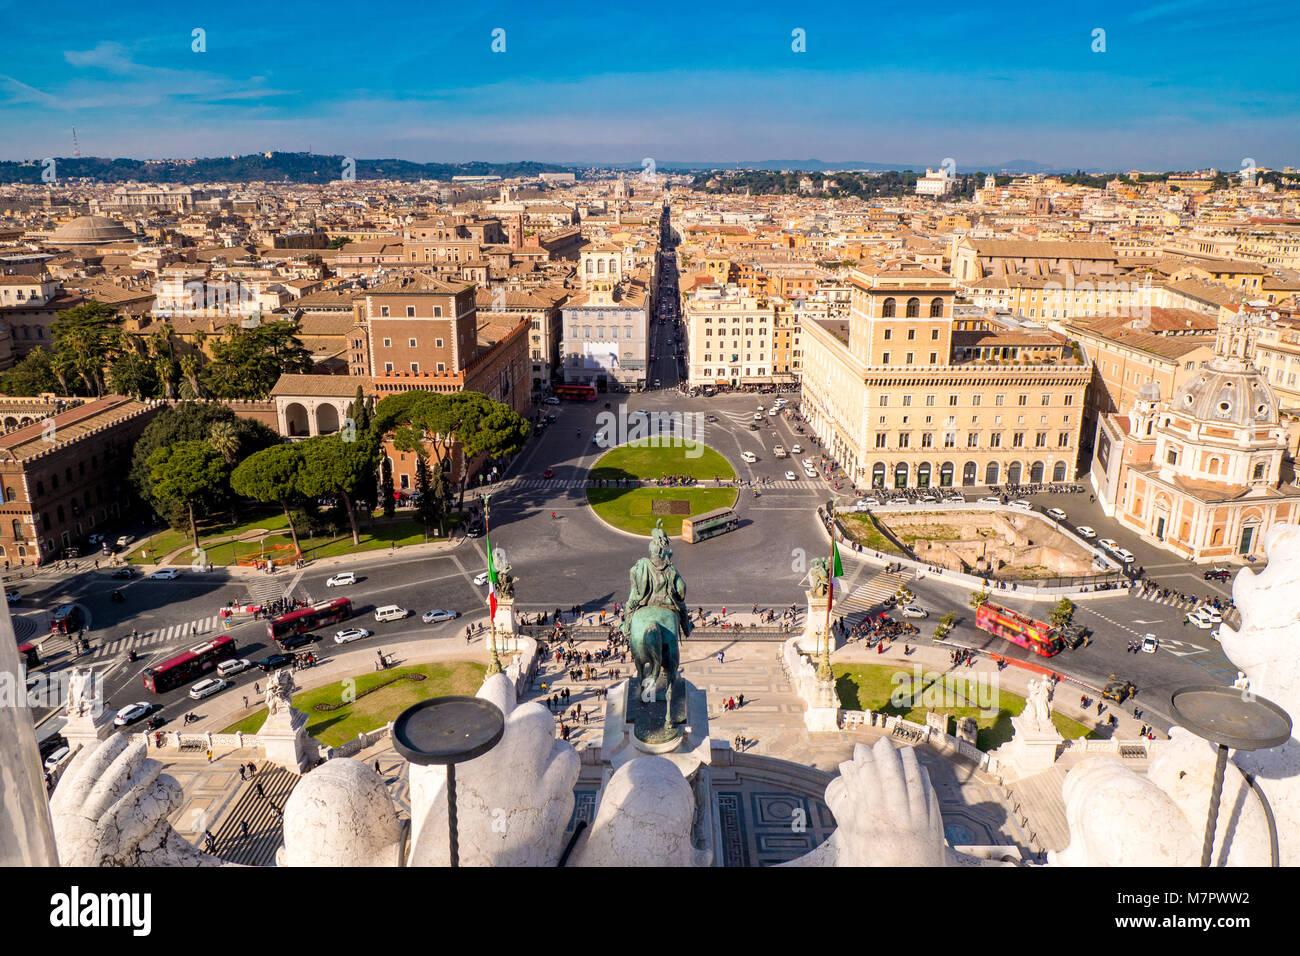 Rome Venice Plazza as seen from above (Piazza Venezia) - Stock Image